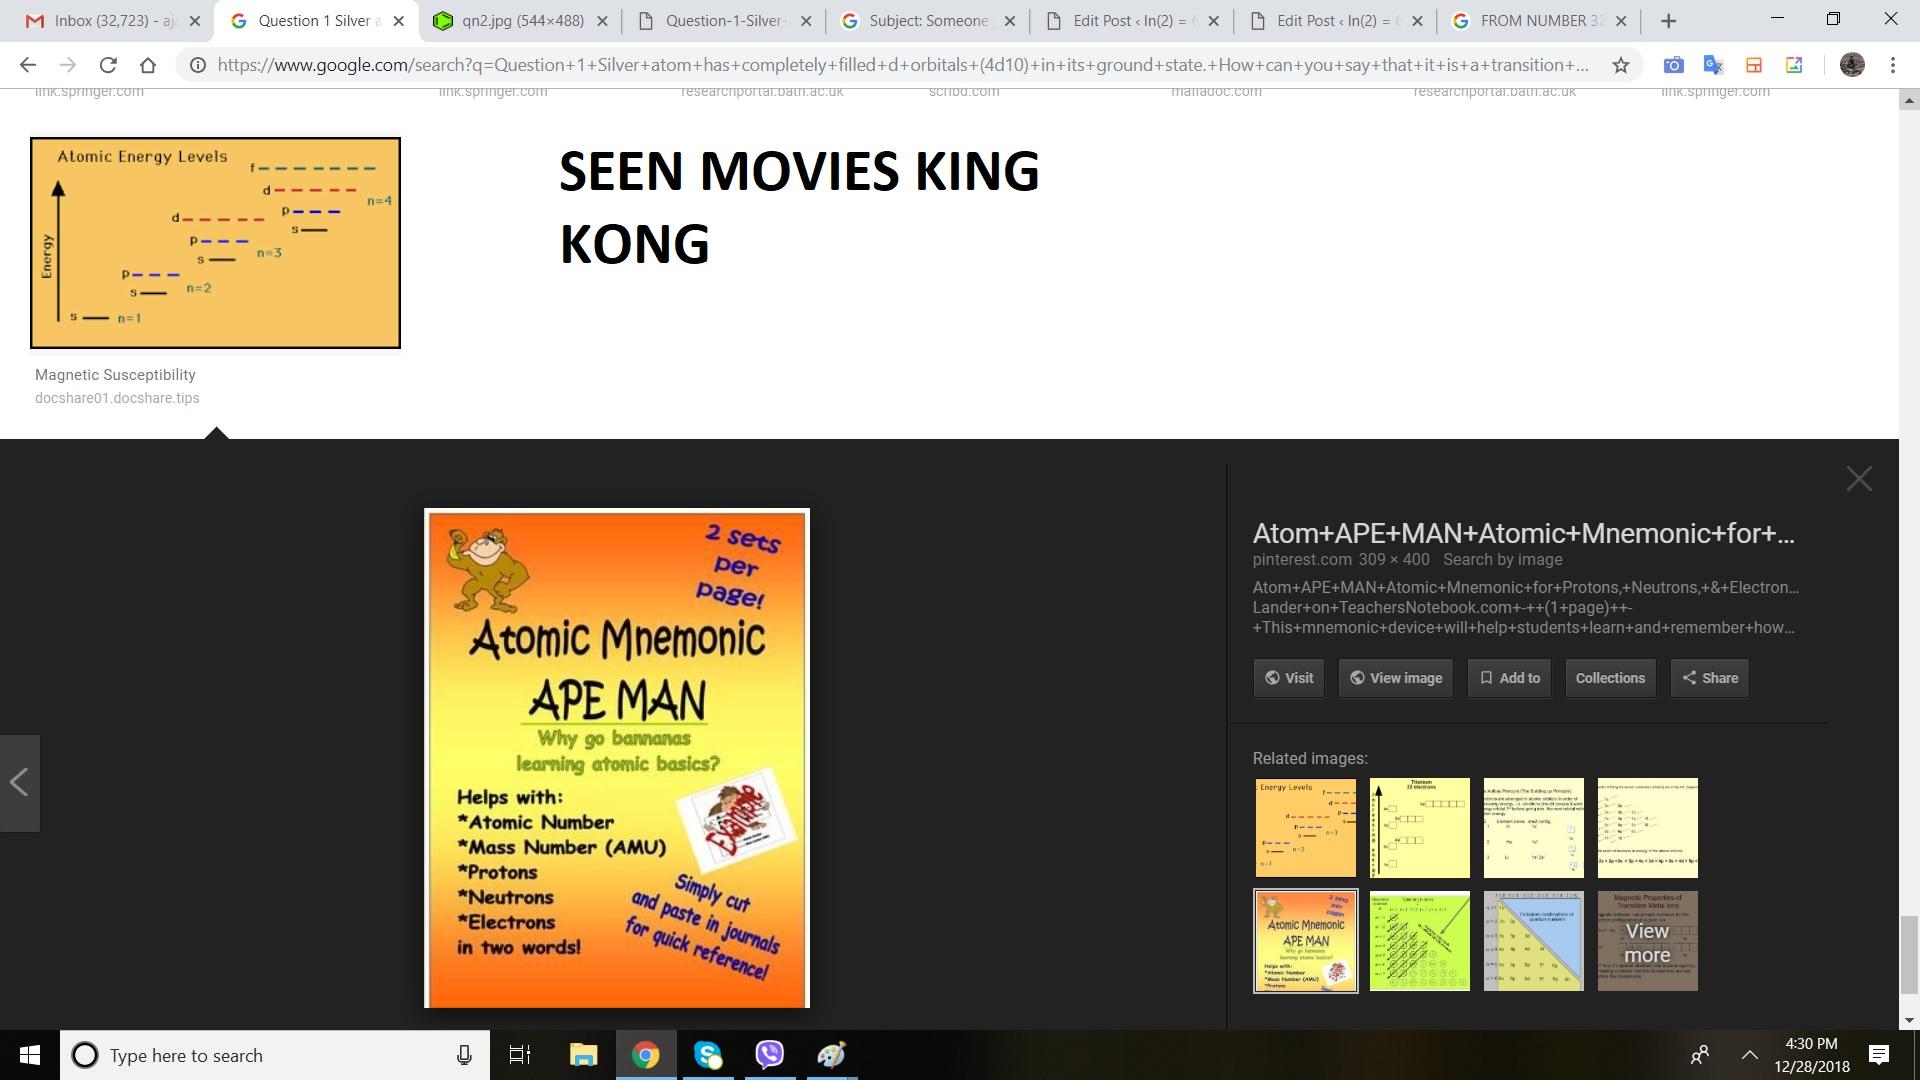 KING KONG MOVIE SEEN BAARCK